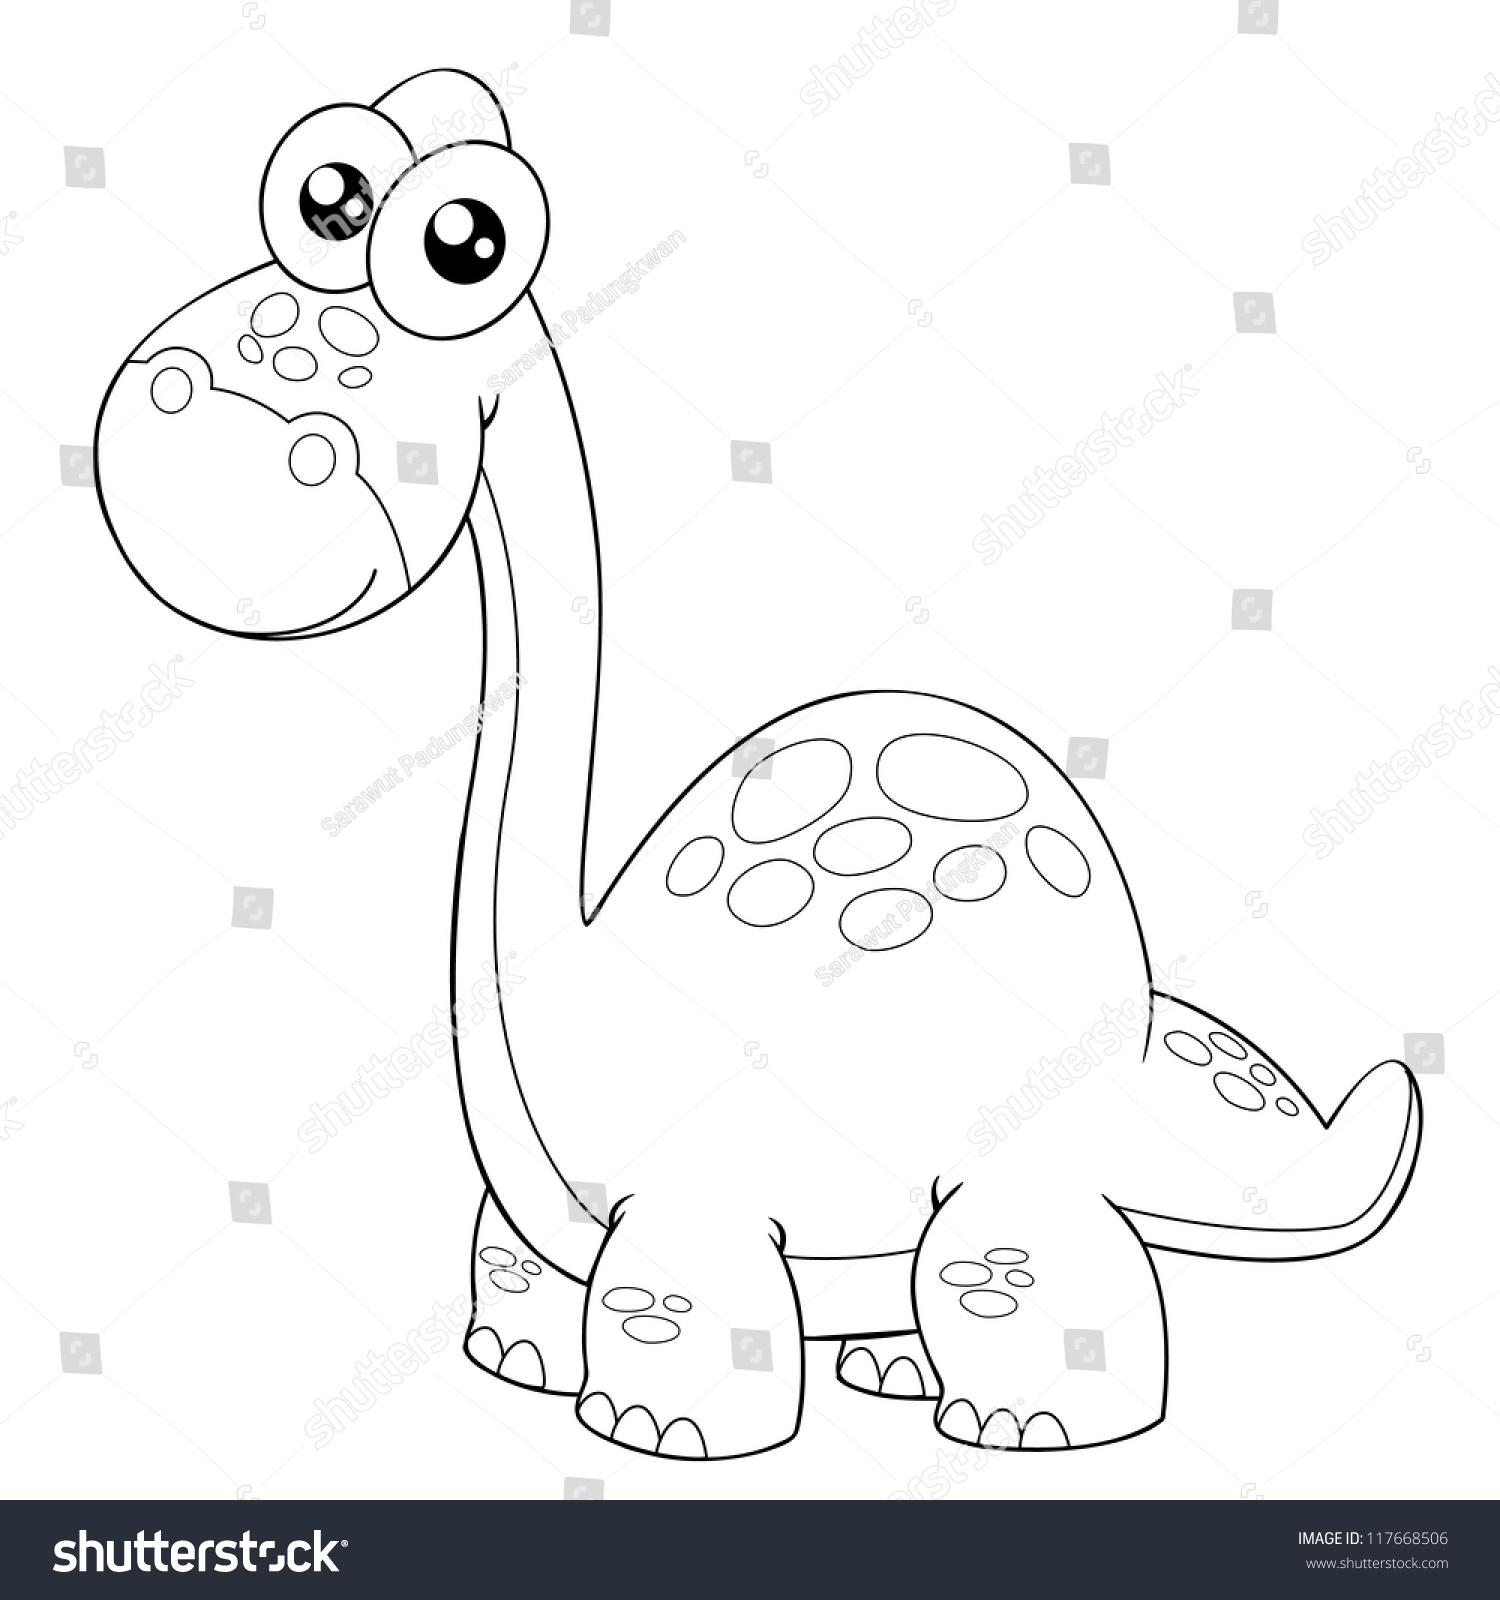 illustration of cartoon dinosaur outline